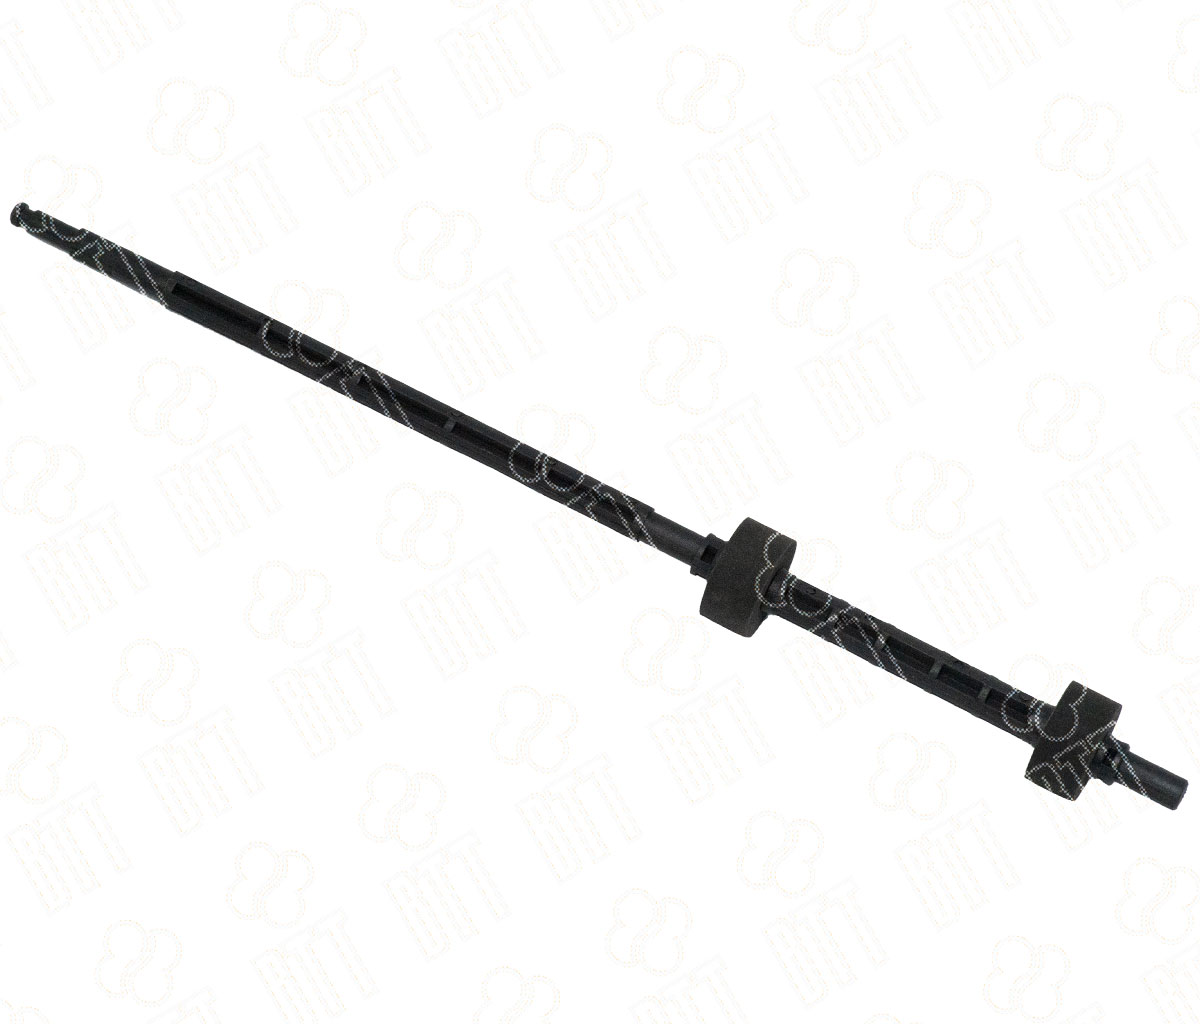 Вал подачи бумаги совм. для HP LJ 1100/3200, paper feed roller